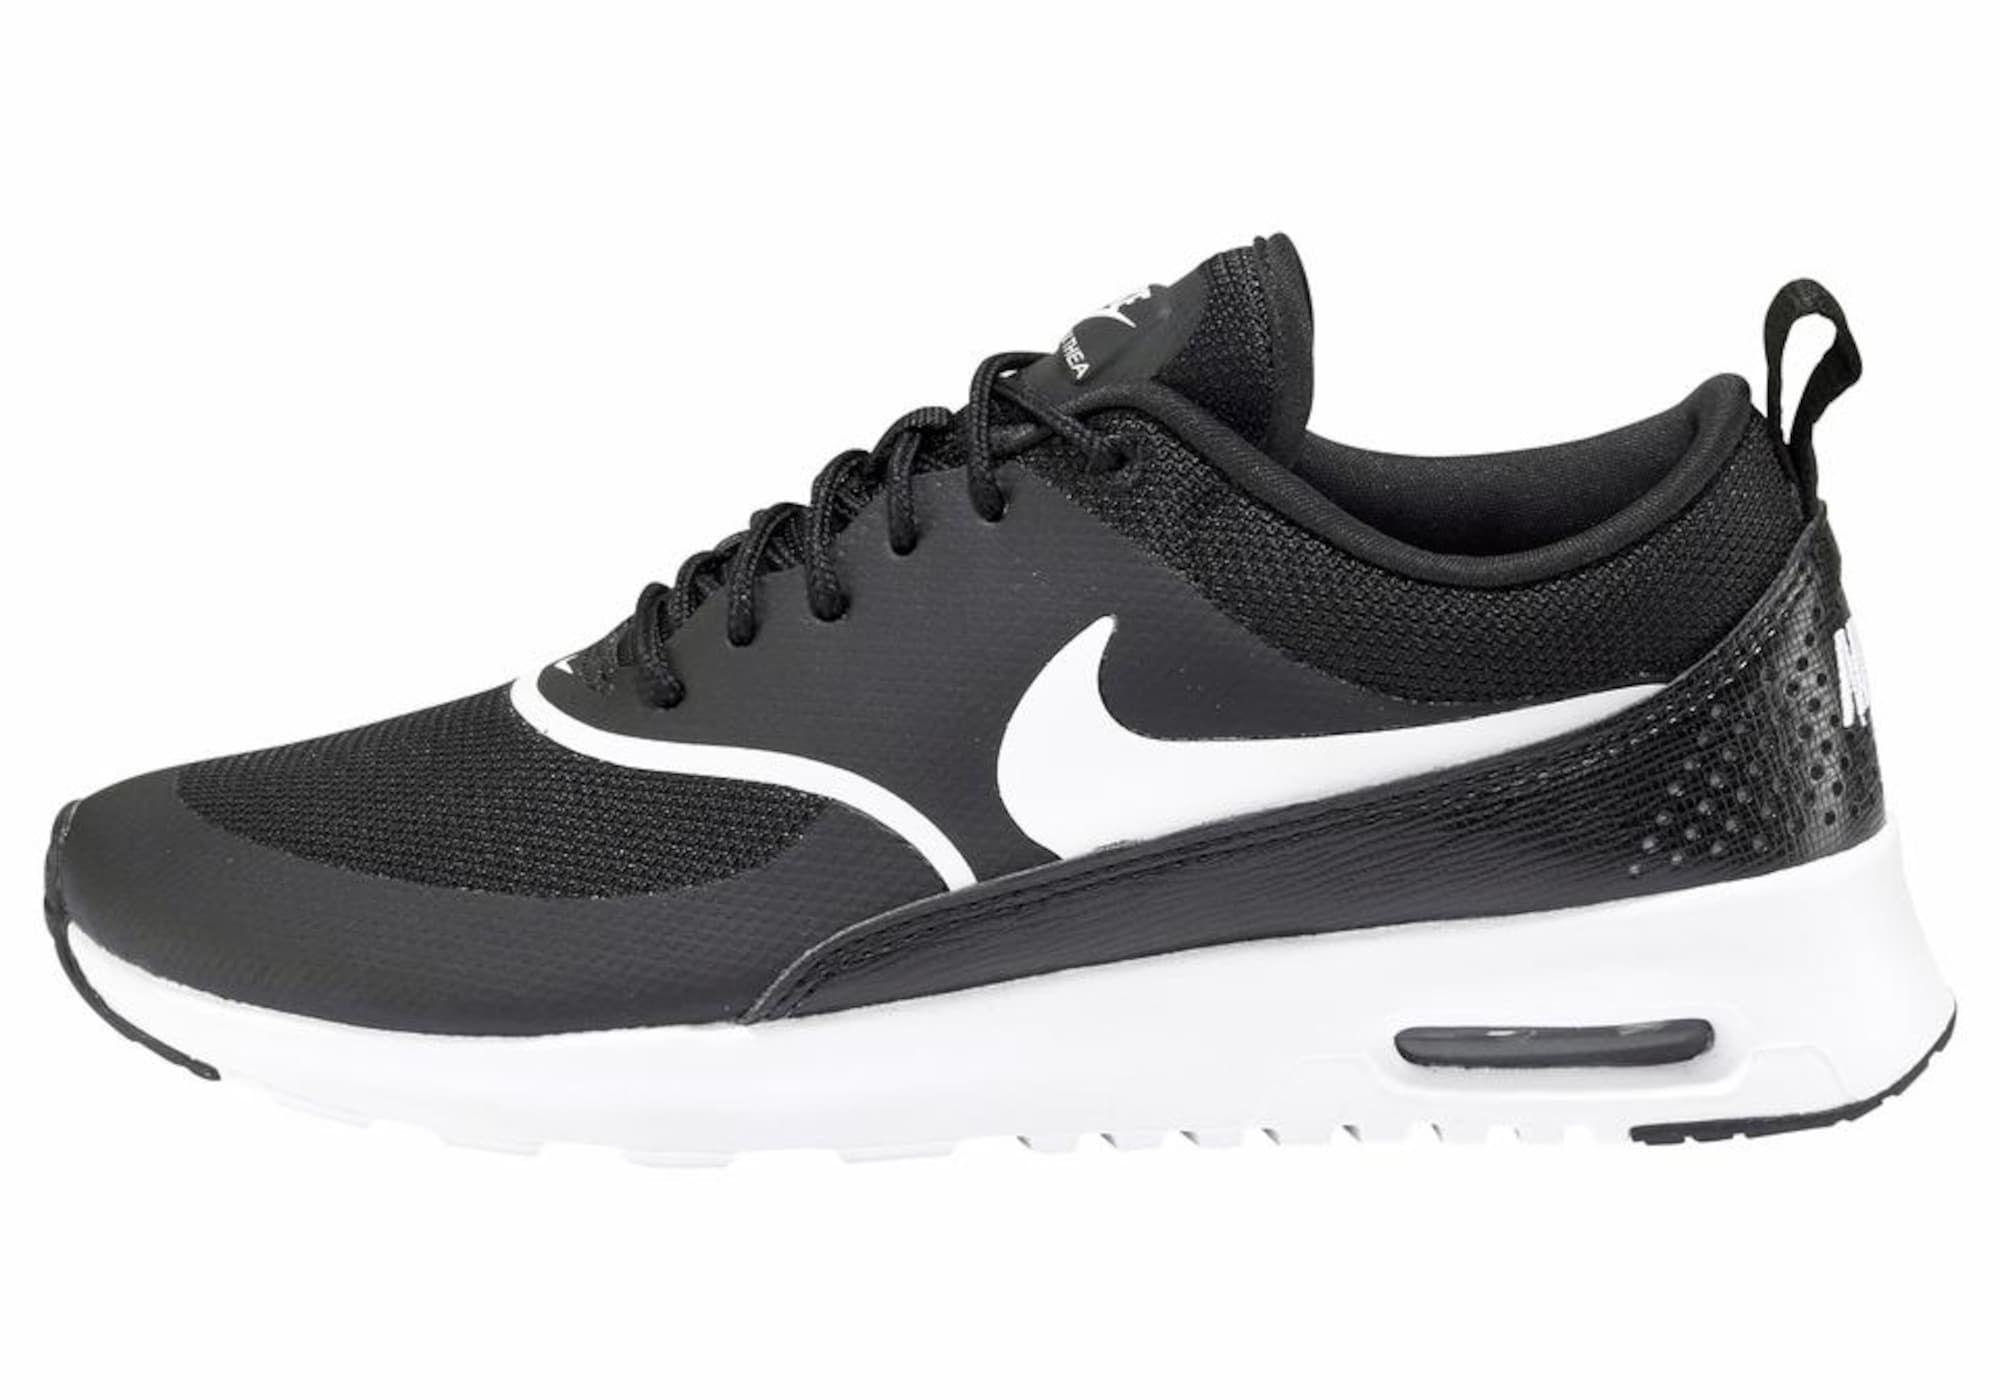 Nike Sportswear Sneaker Air Max Thea Damen Schwarz Weiss Grosse 36 5 Nike Sportswear Air Max Thea Und Nike